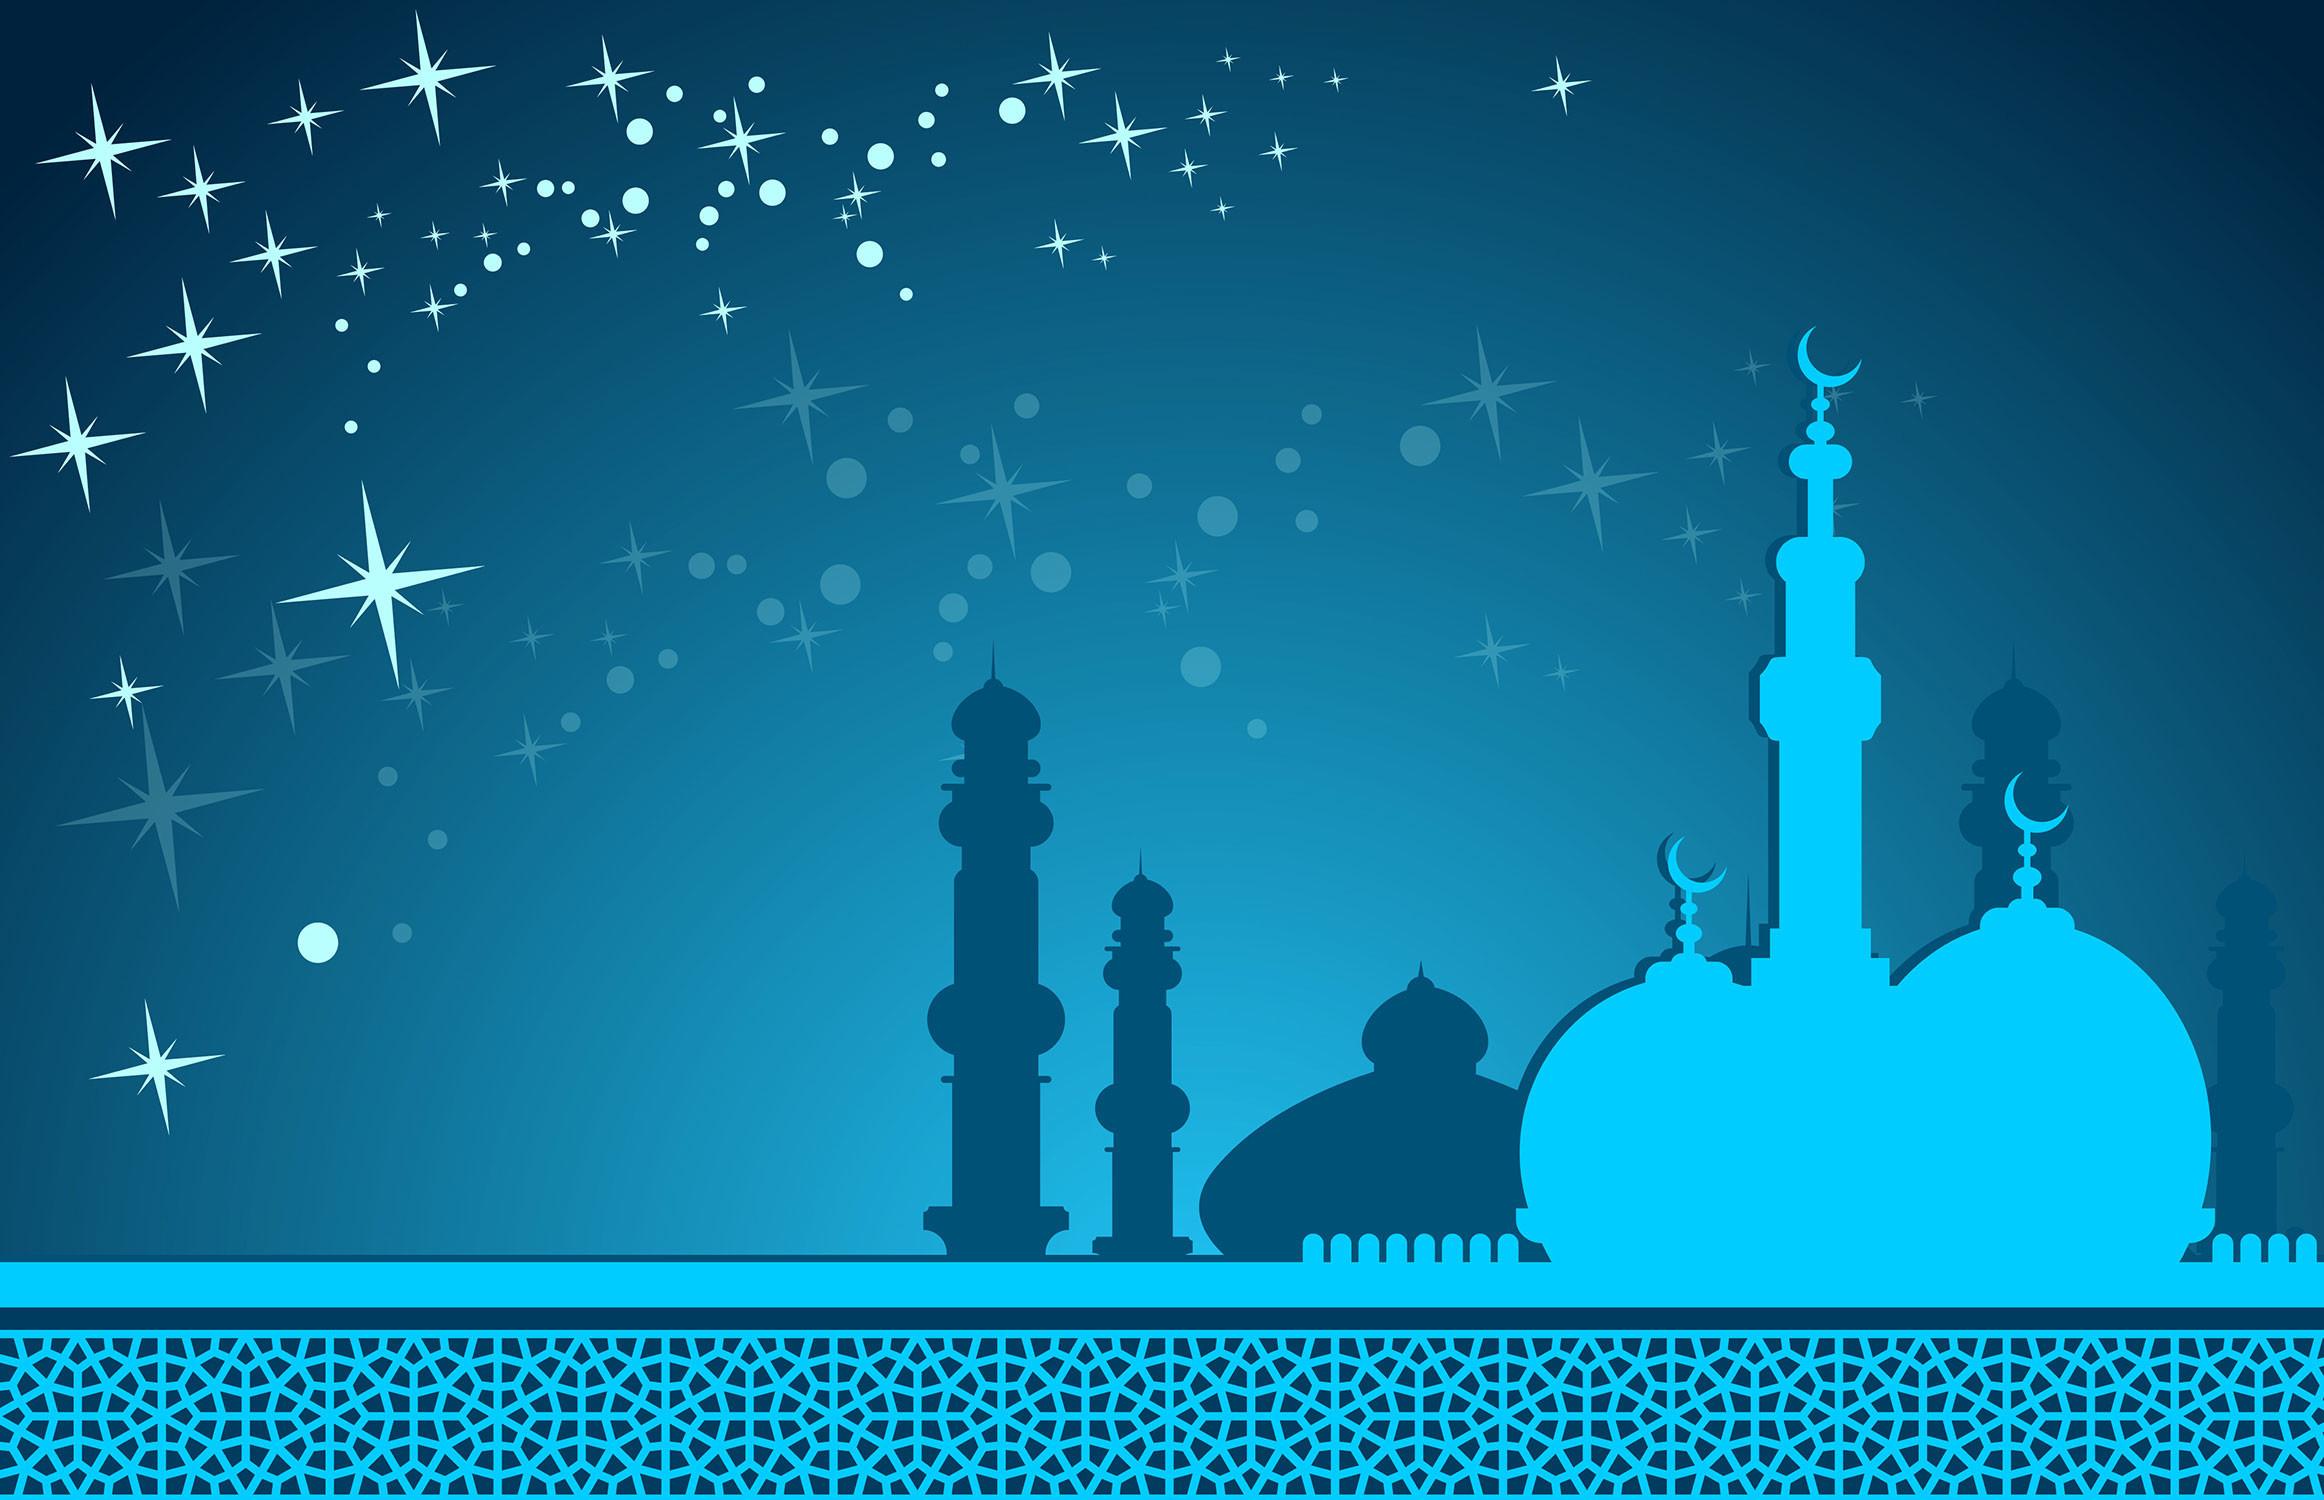 Eid Mubarak Wallpapers 51 Images